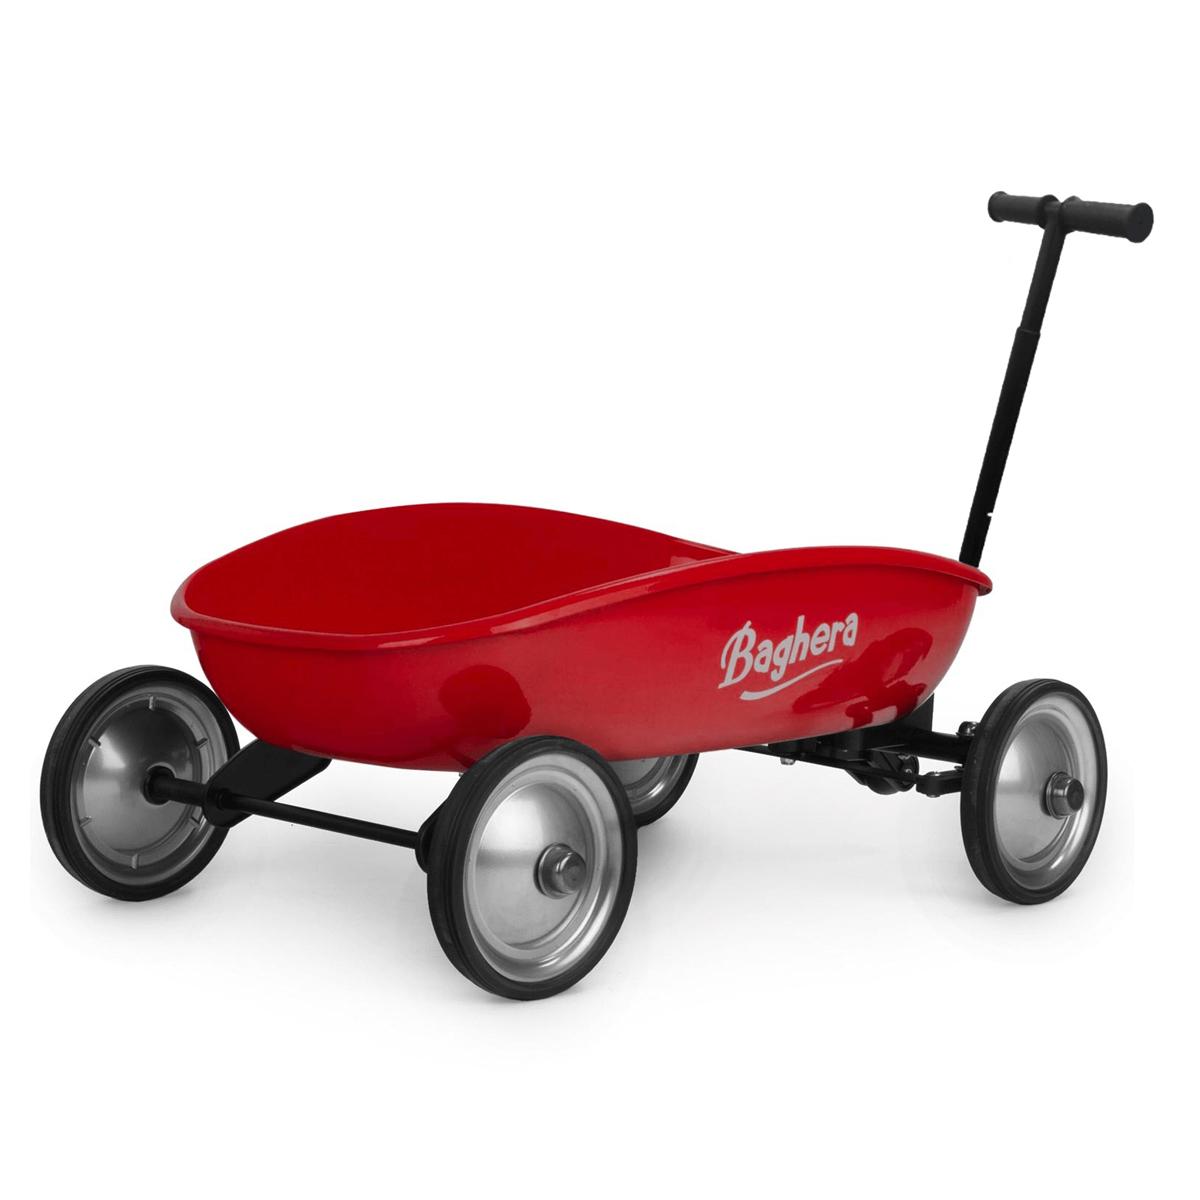 Mes premiers jouets Mon Grand Chariot - Rouge Mon Grand Chariot - Rouge